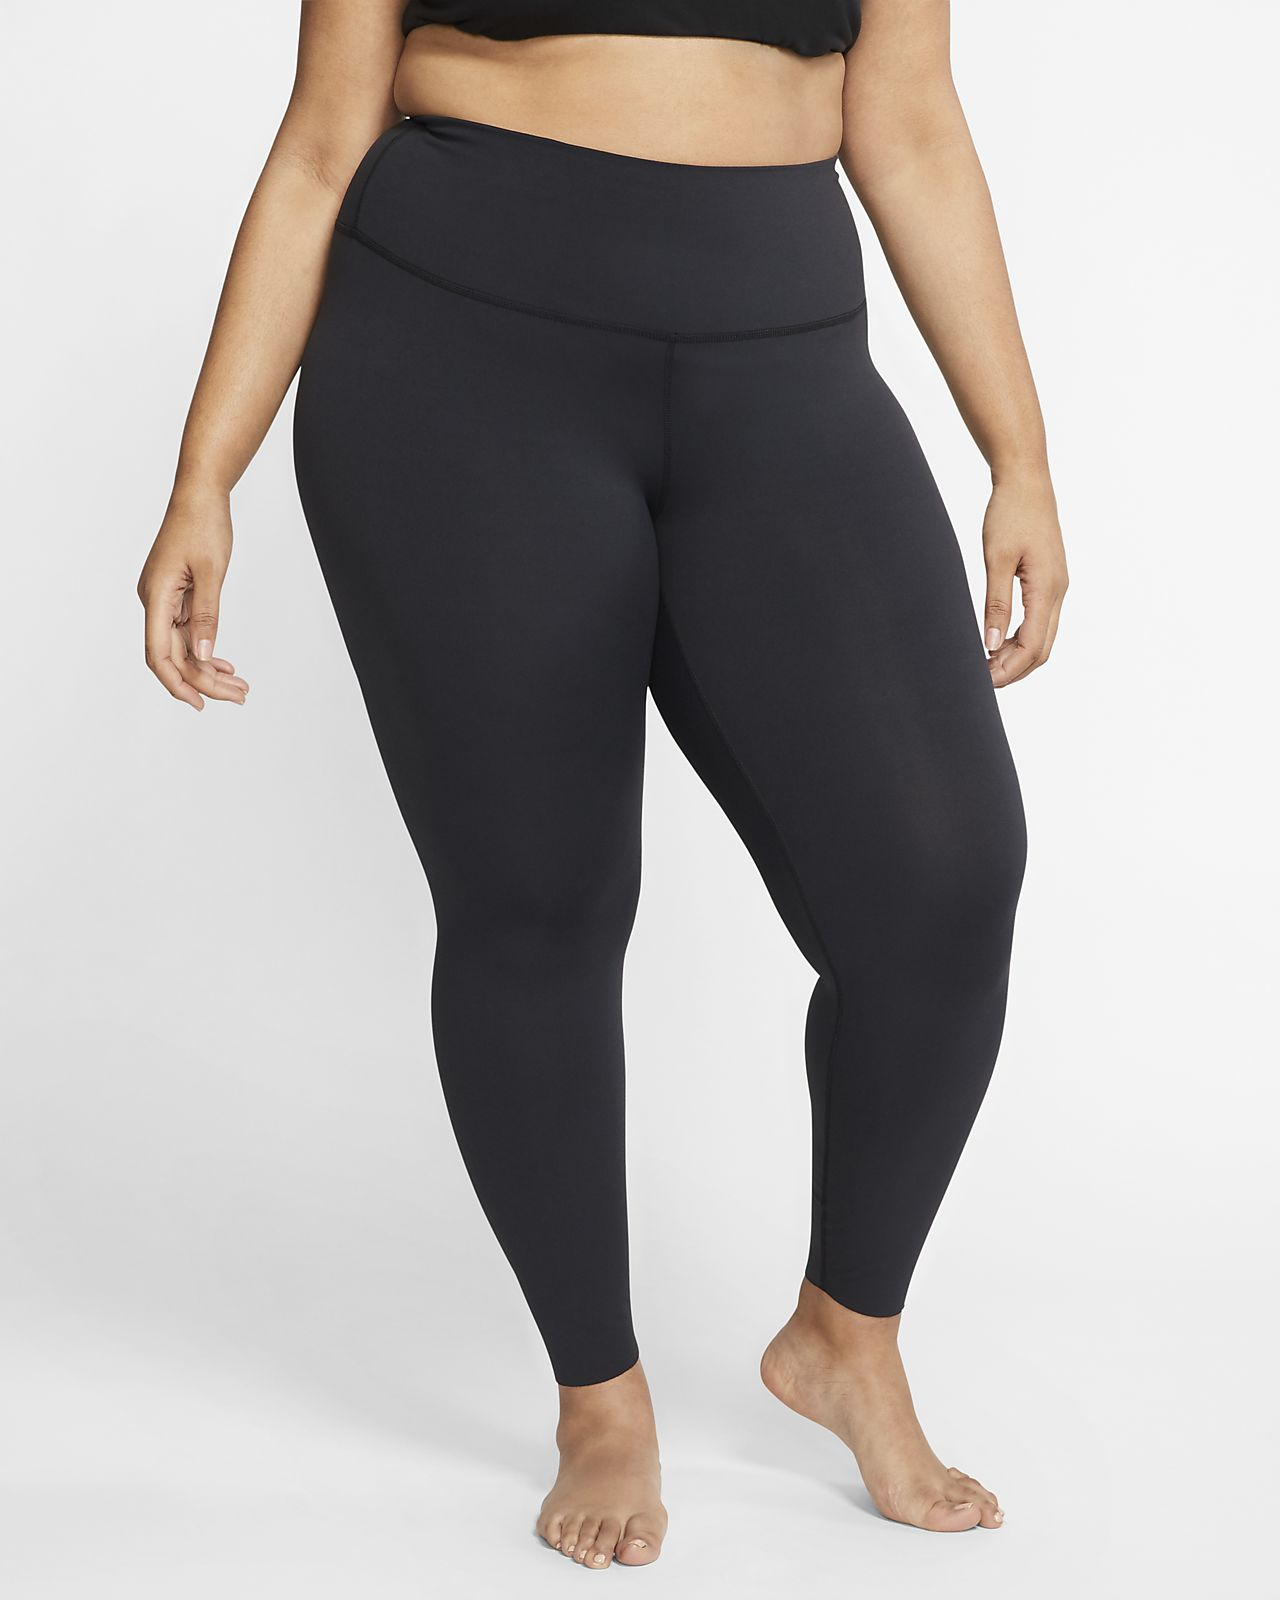 Legging Infinalon 7/8 Nike Yoga Luxe pour Femme (grande taille)